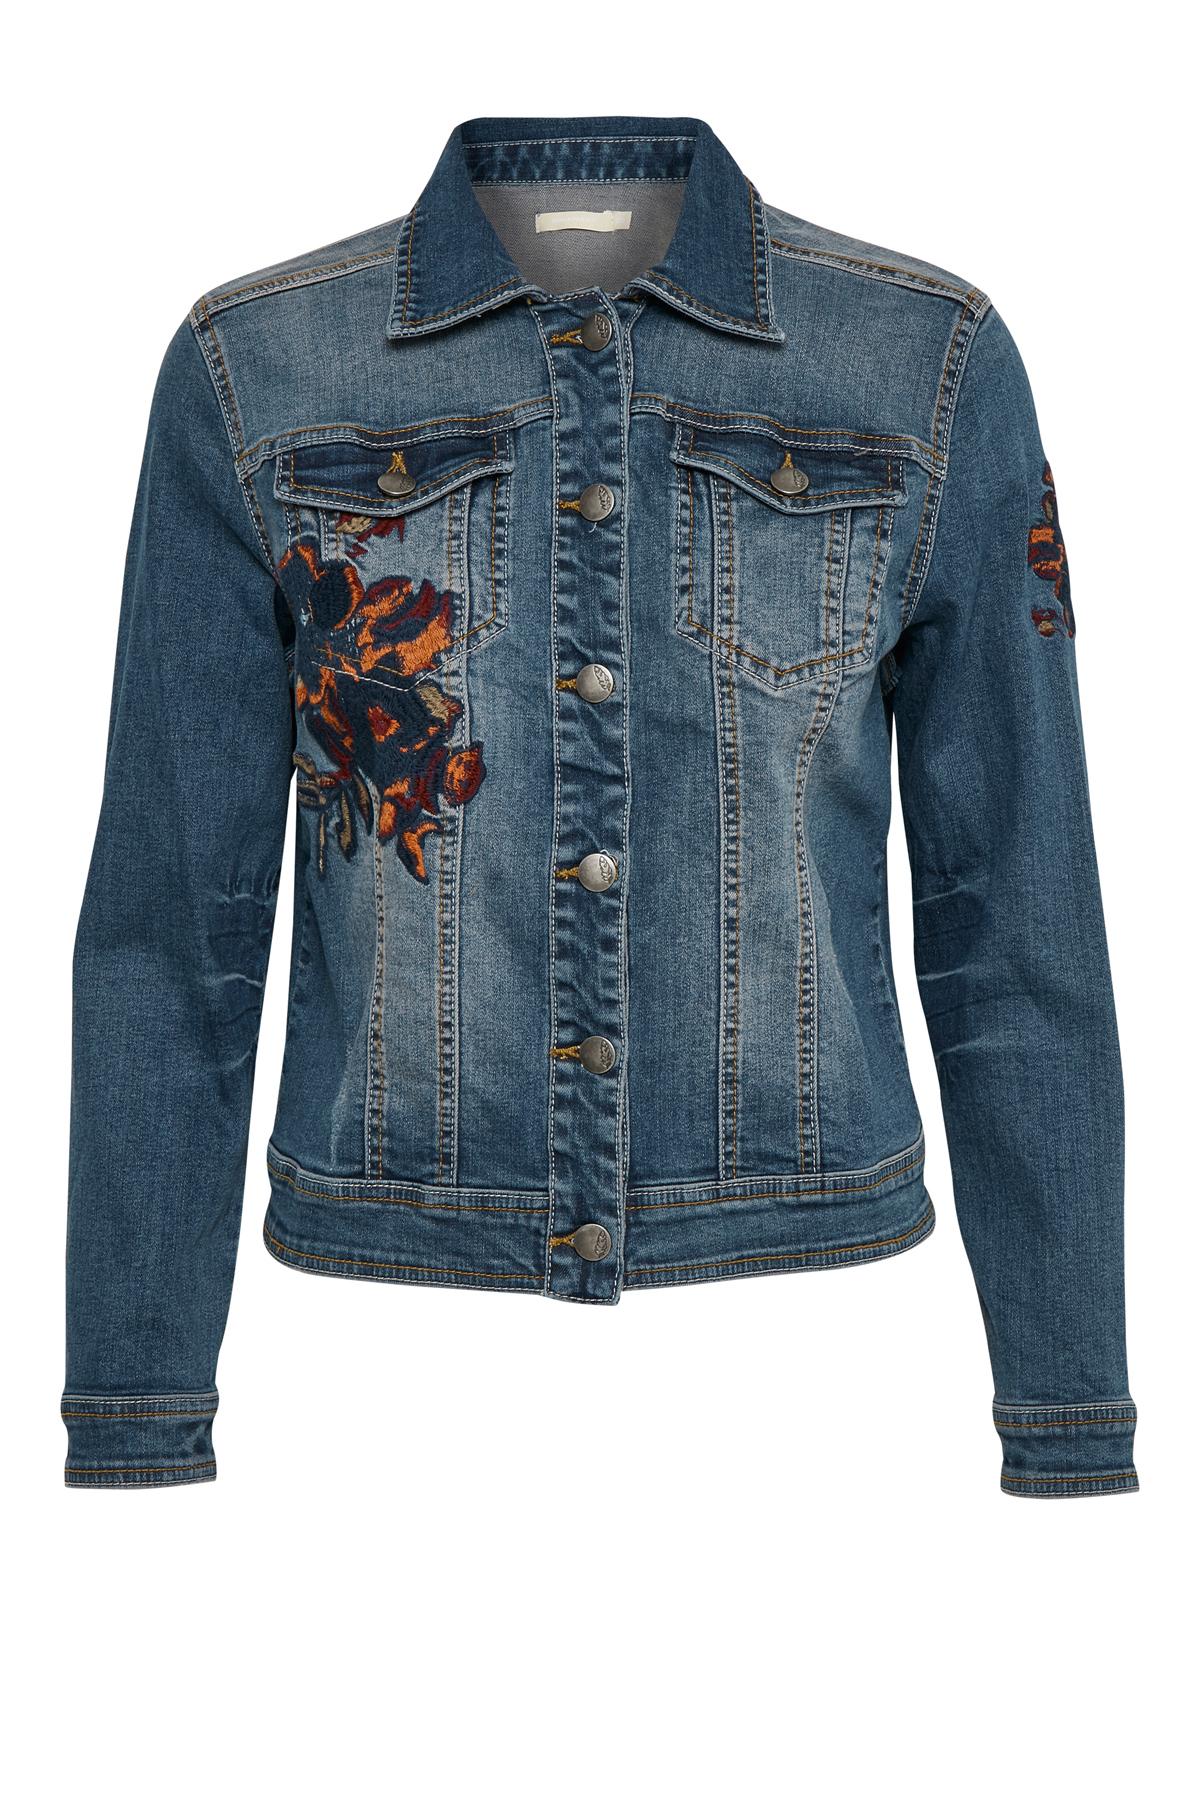 Denimblau Jeansjacke von Bon'A Parte – Shoppen Sie Denimblau Jeansjacke ab Gr. S-2XL hier